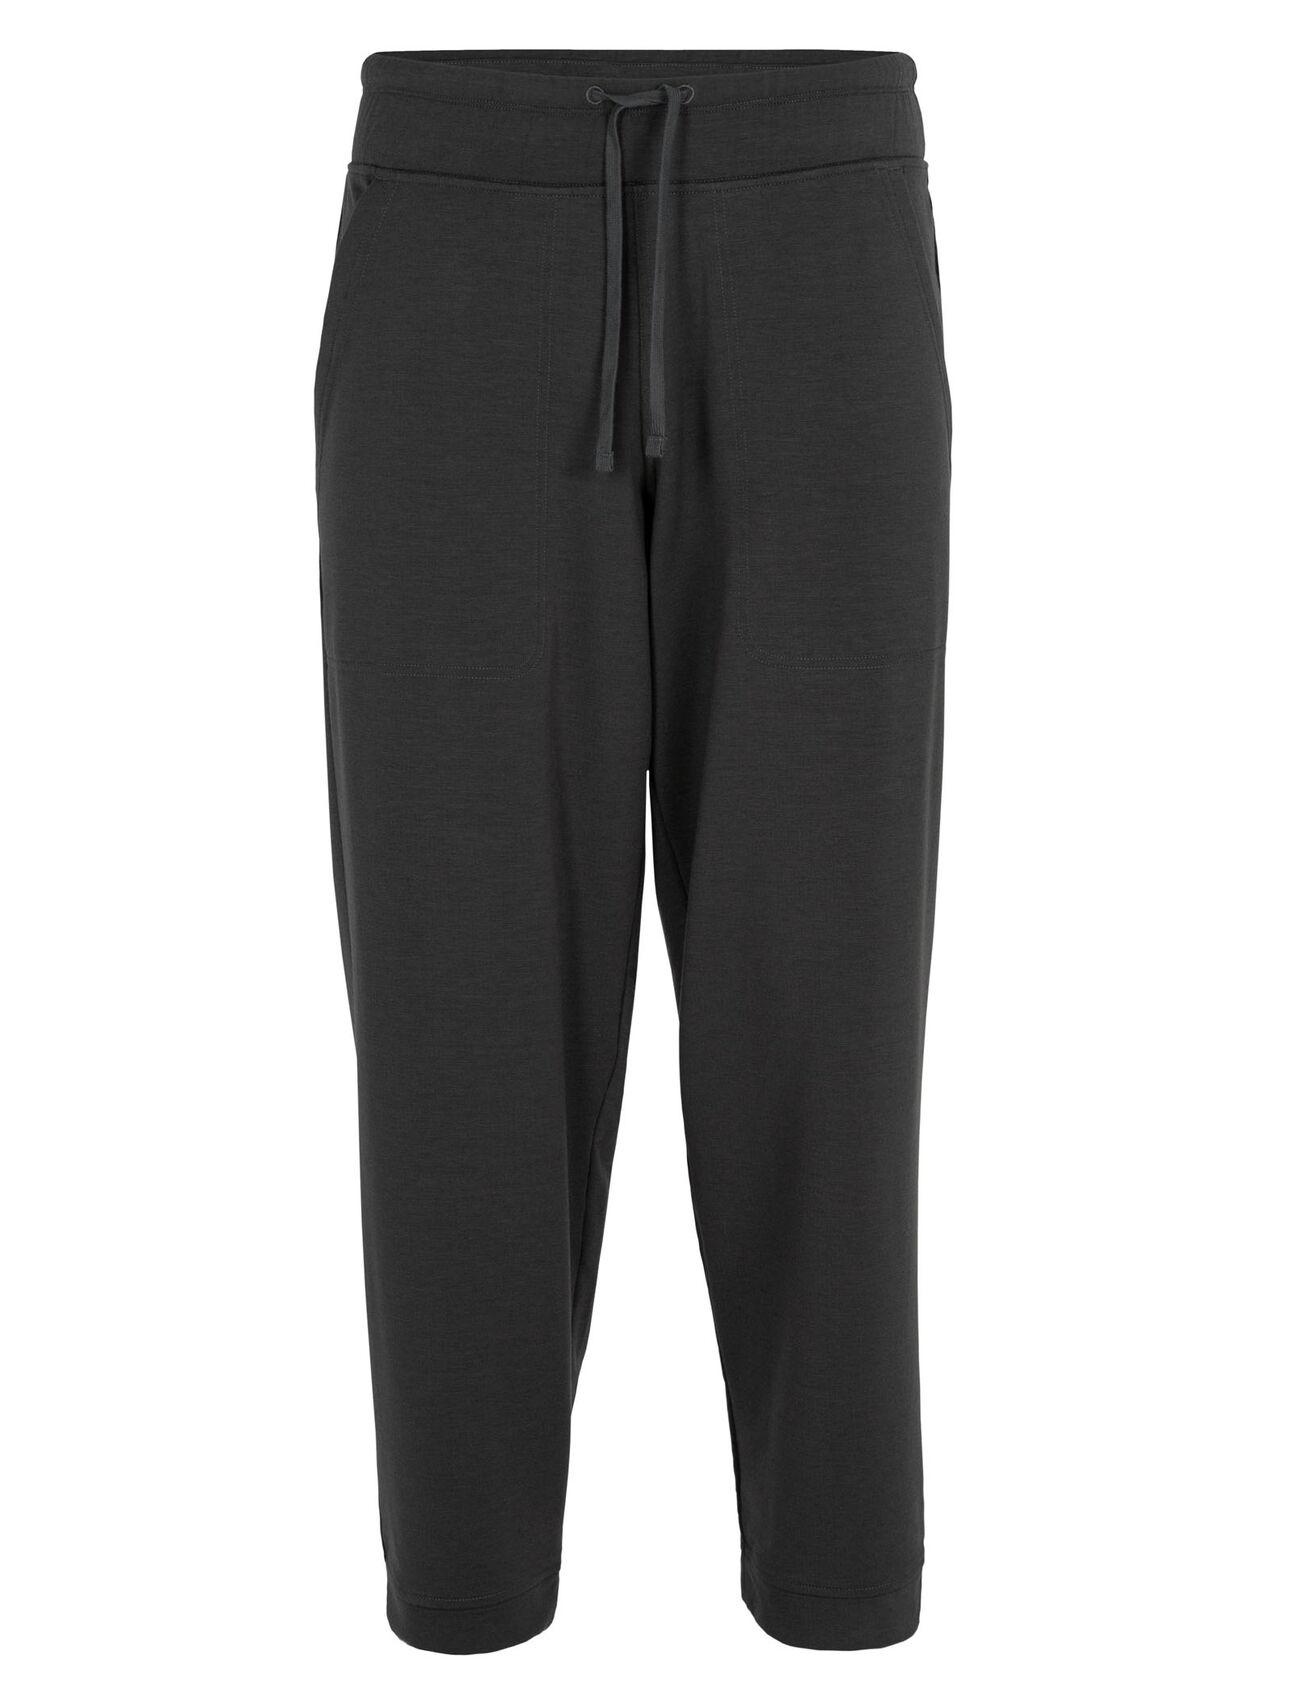 Cool-Lite™ Merino Utility Explore Cropped Pants